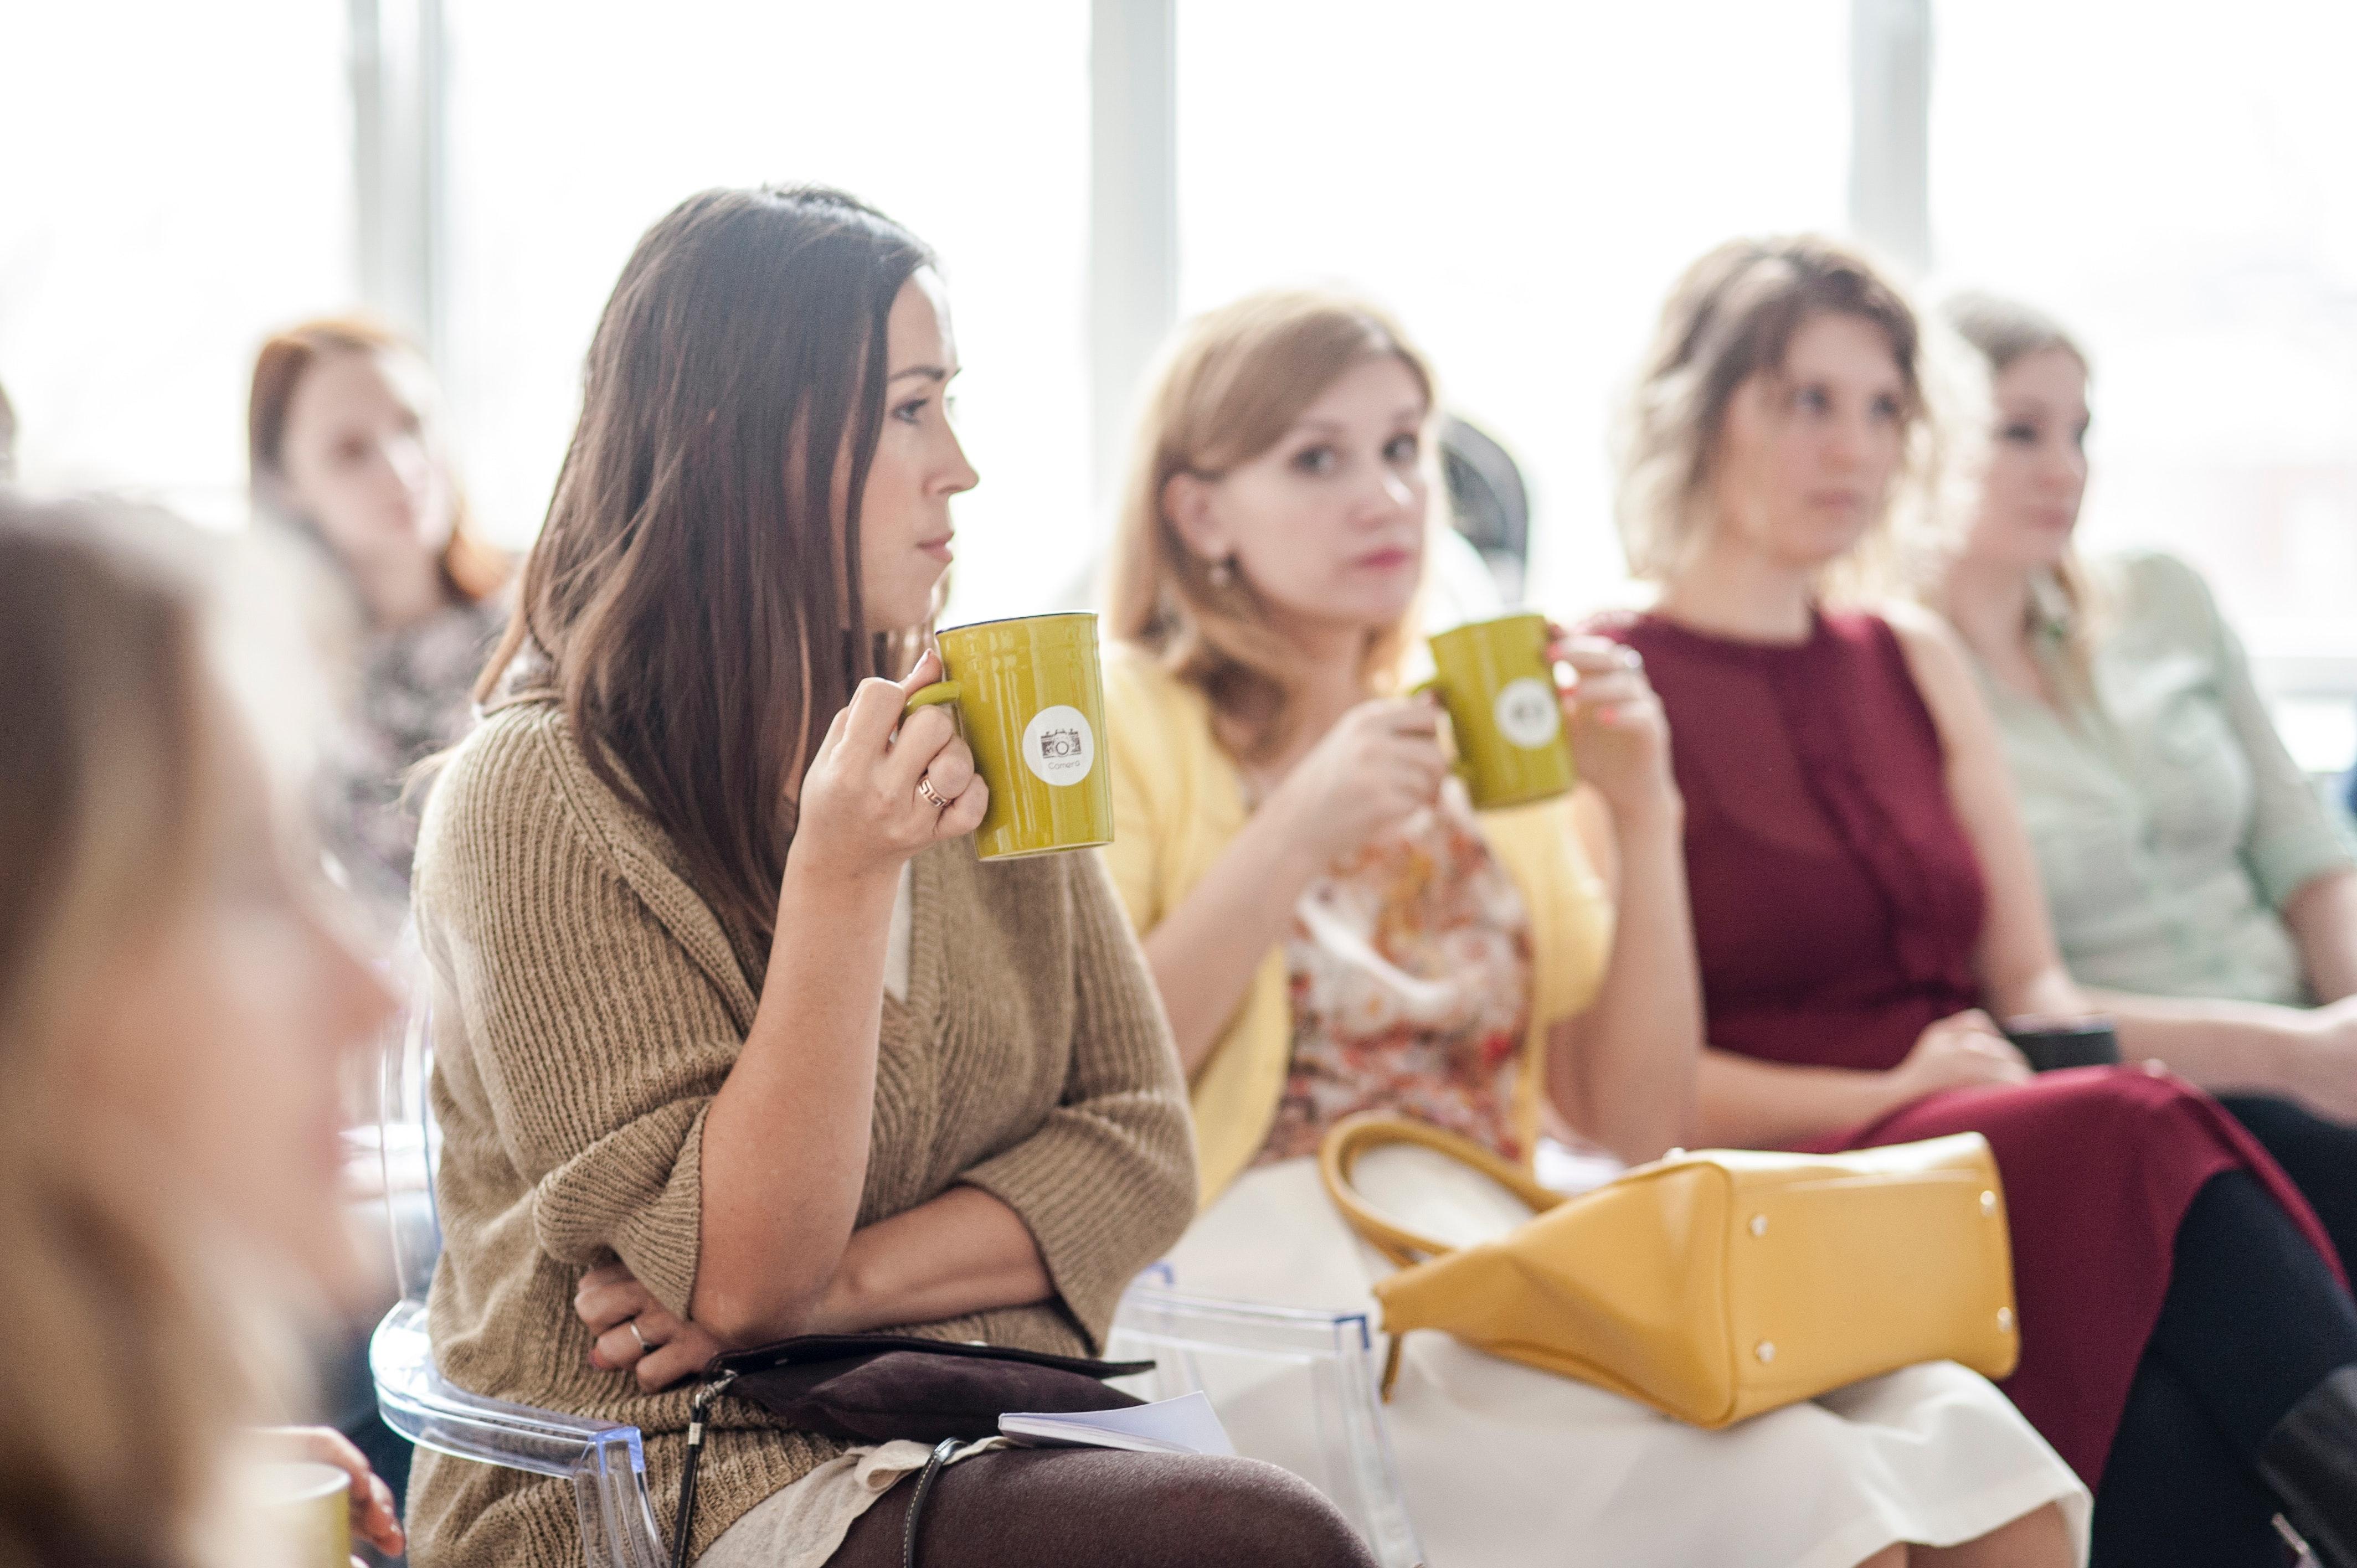 Woman wearing brown corduroy coat holding mug while sitting on chair photo